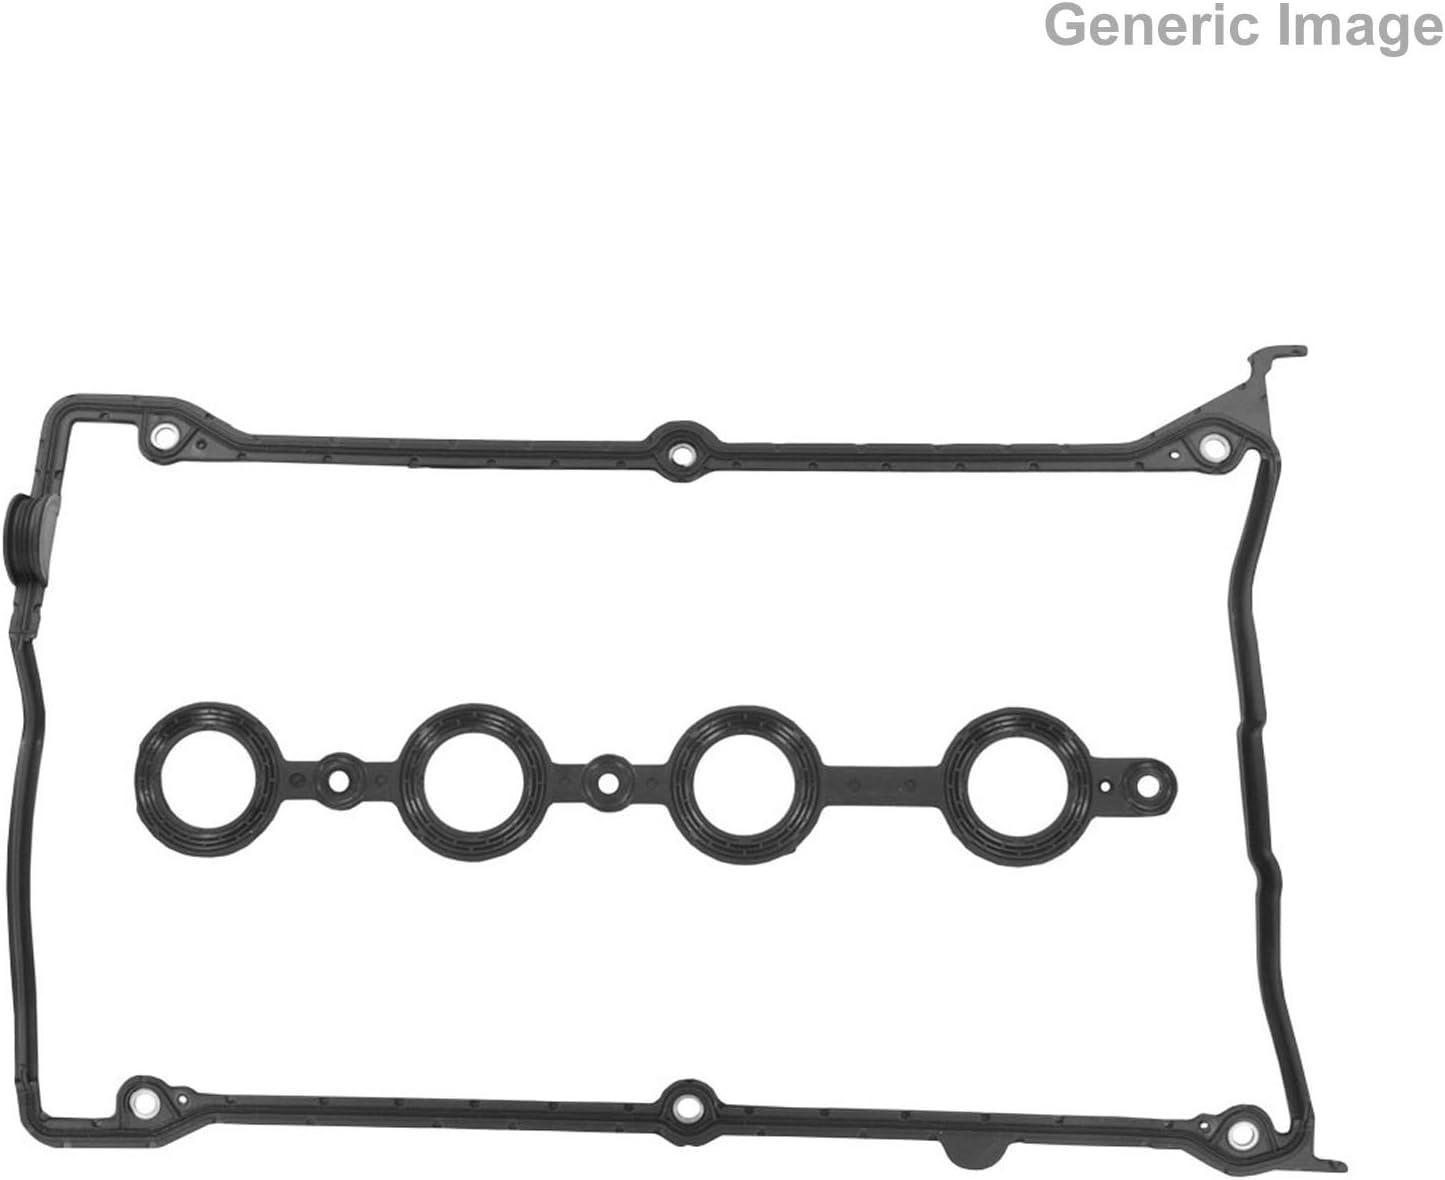 Cylinder Head Cover Herth+Buss Jakoparts J1222069 Gasket